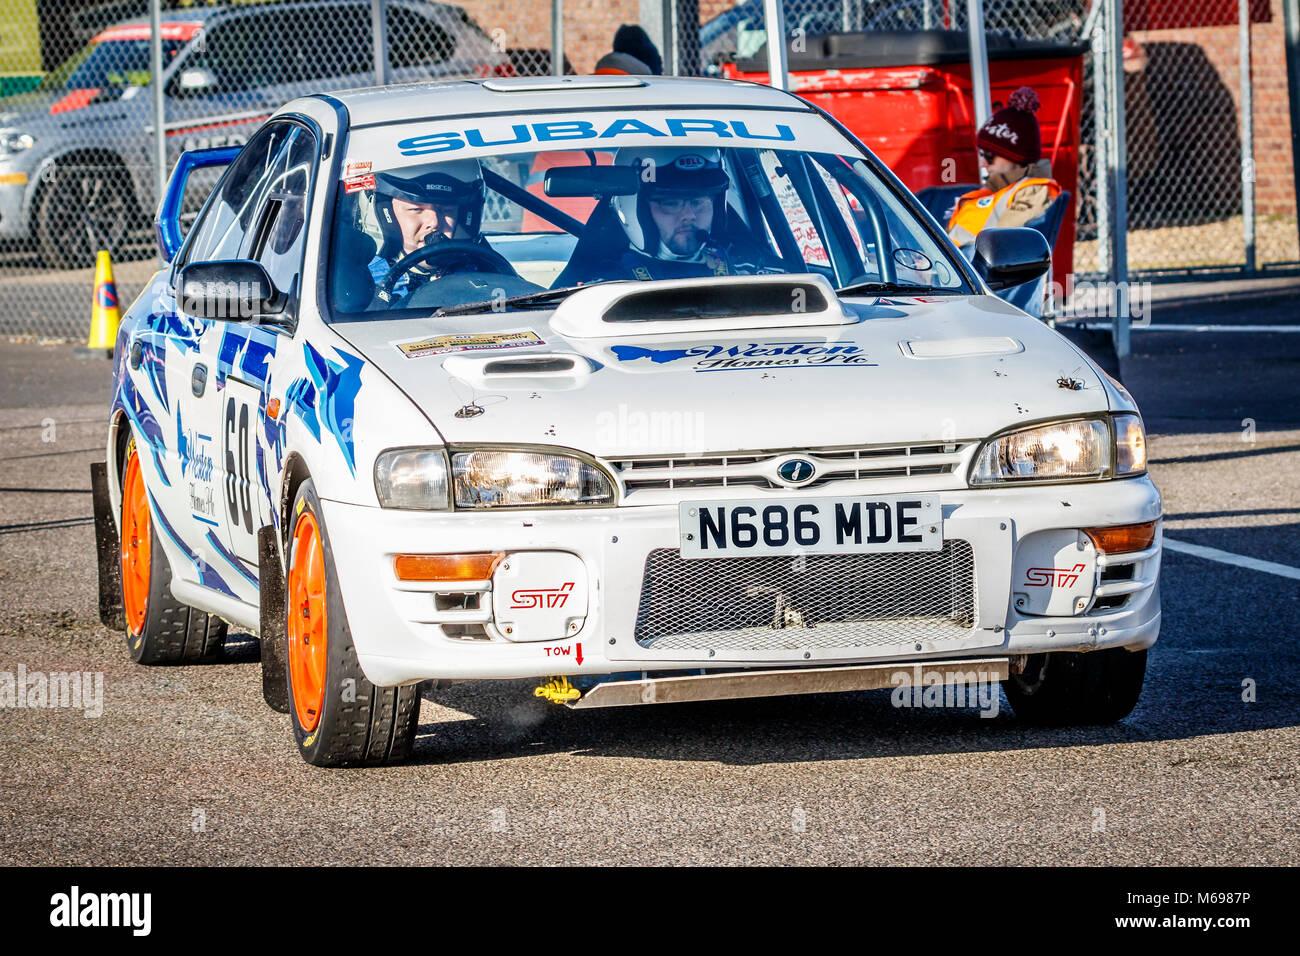 Shaun Weston and Dean Mevo in the Subaru Impreza in the paddock at the 2018 Motorsport News Snetterton Stage Rally, - Stock Image